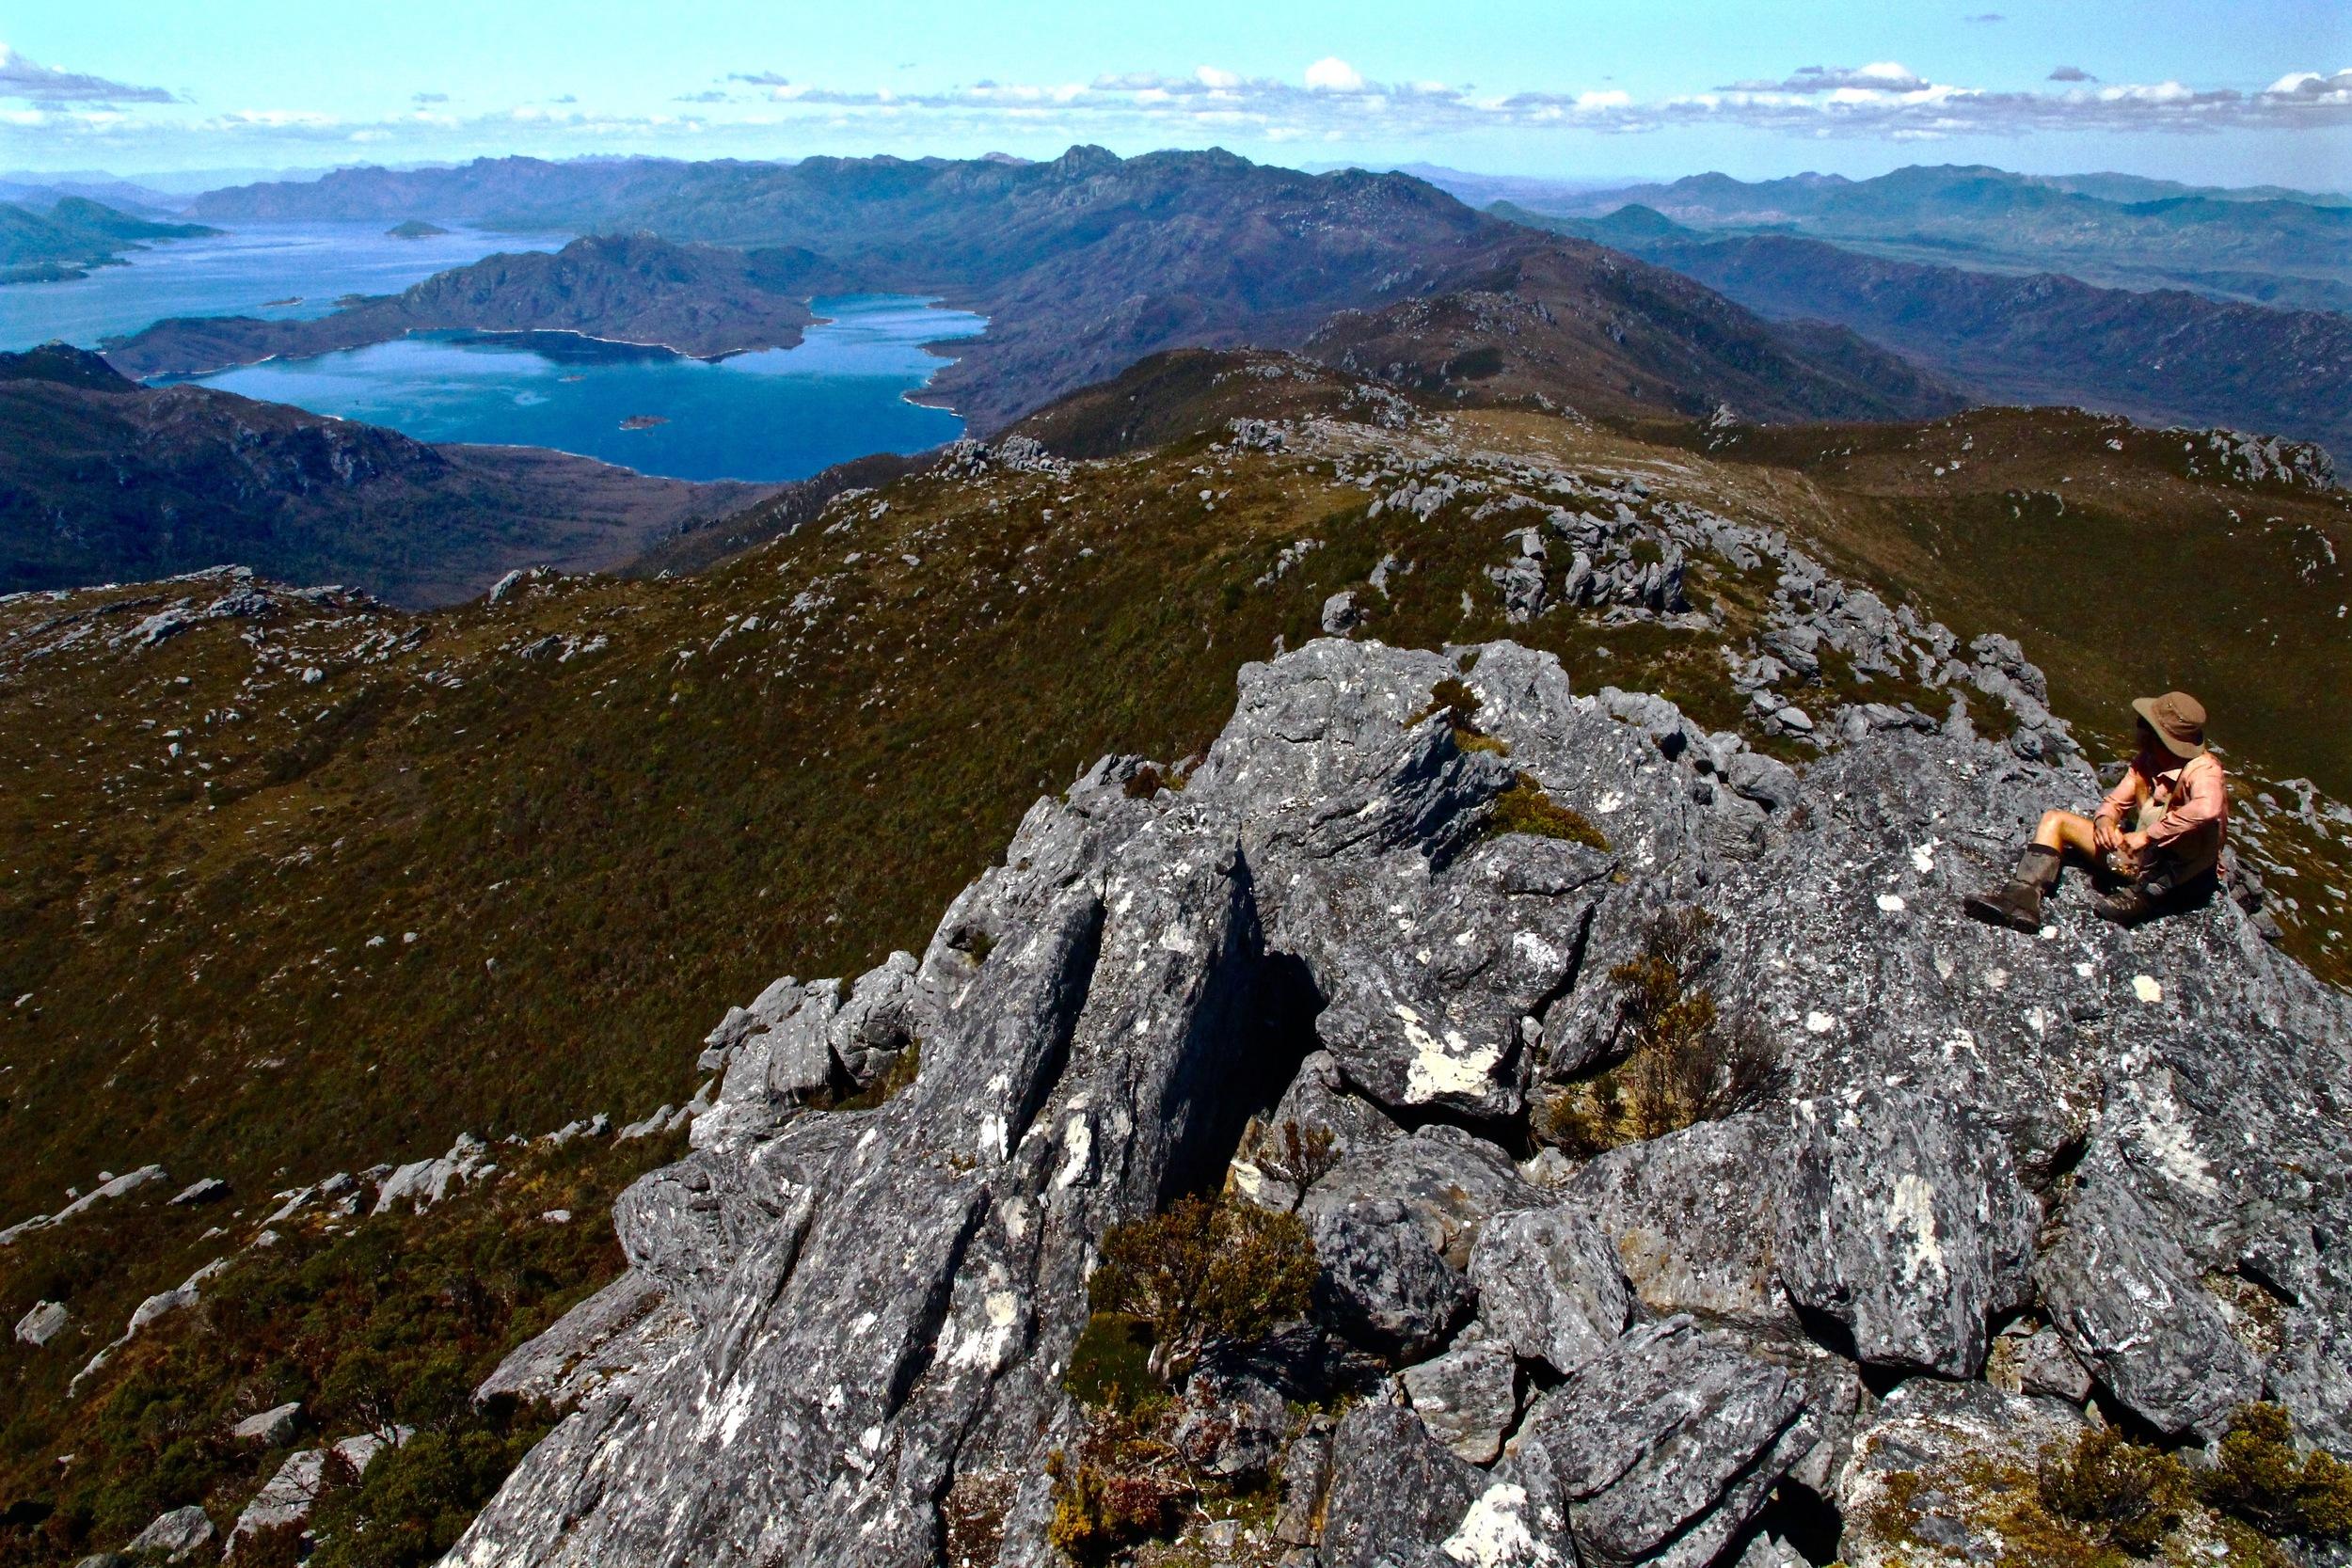 Wild Pedder - The Frankland & Wilmot Ranges from Mount Sprent